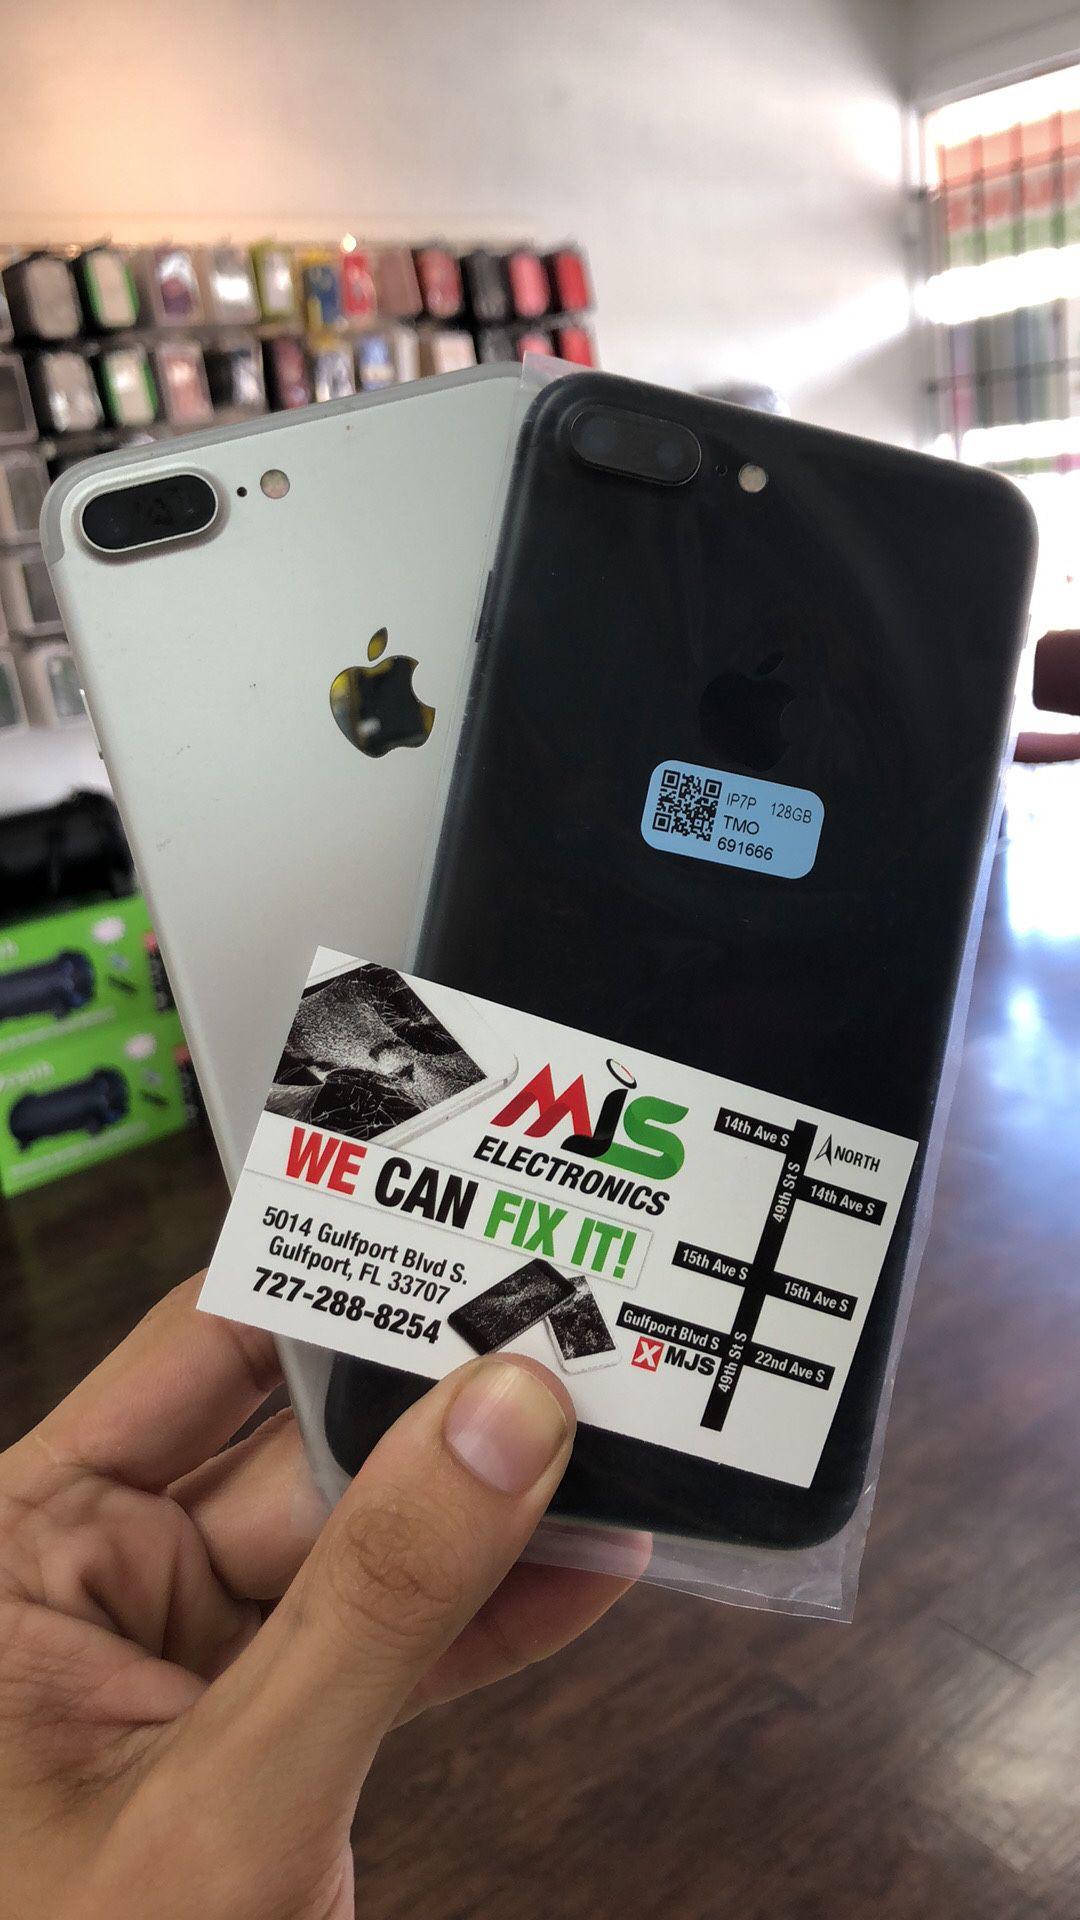 iPhone 7plus factory unlocked128GB